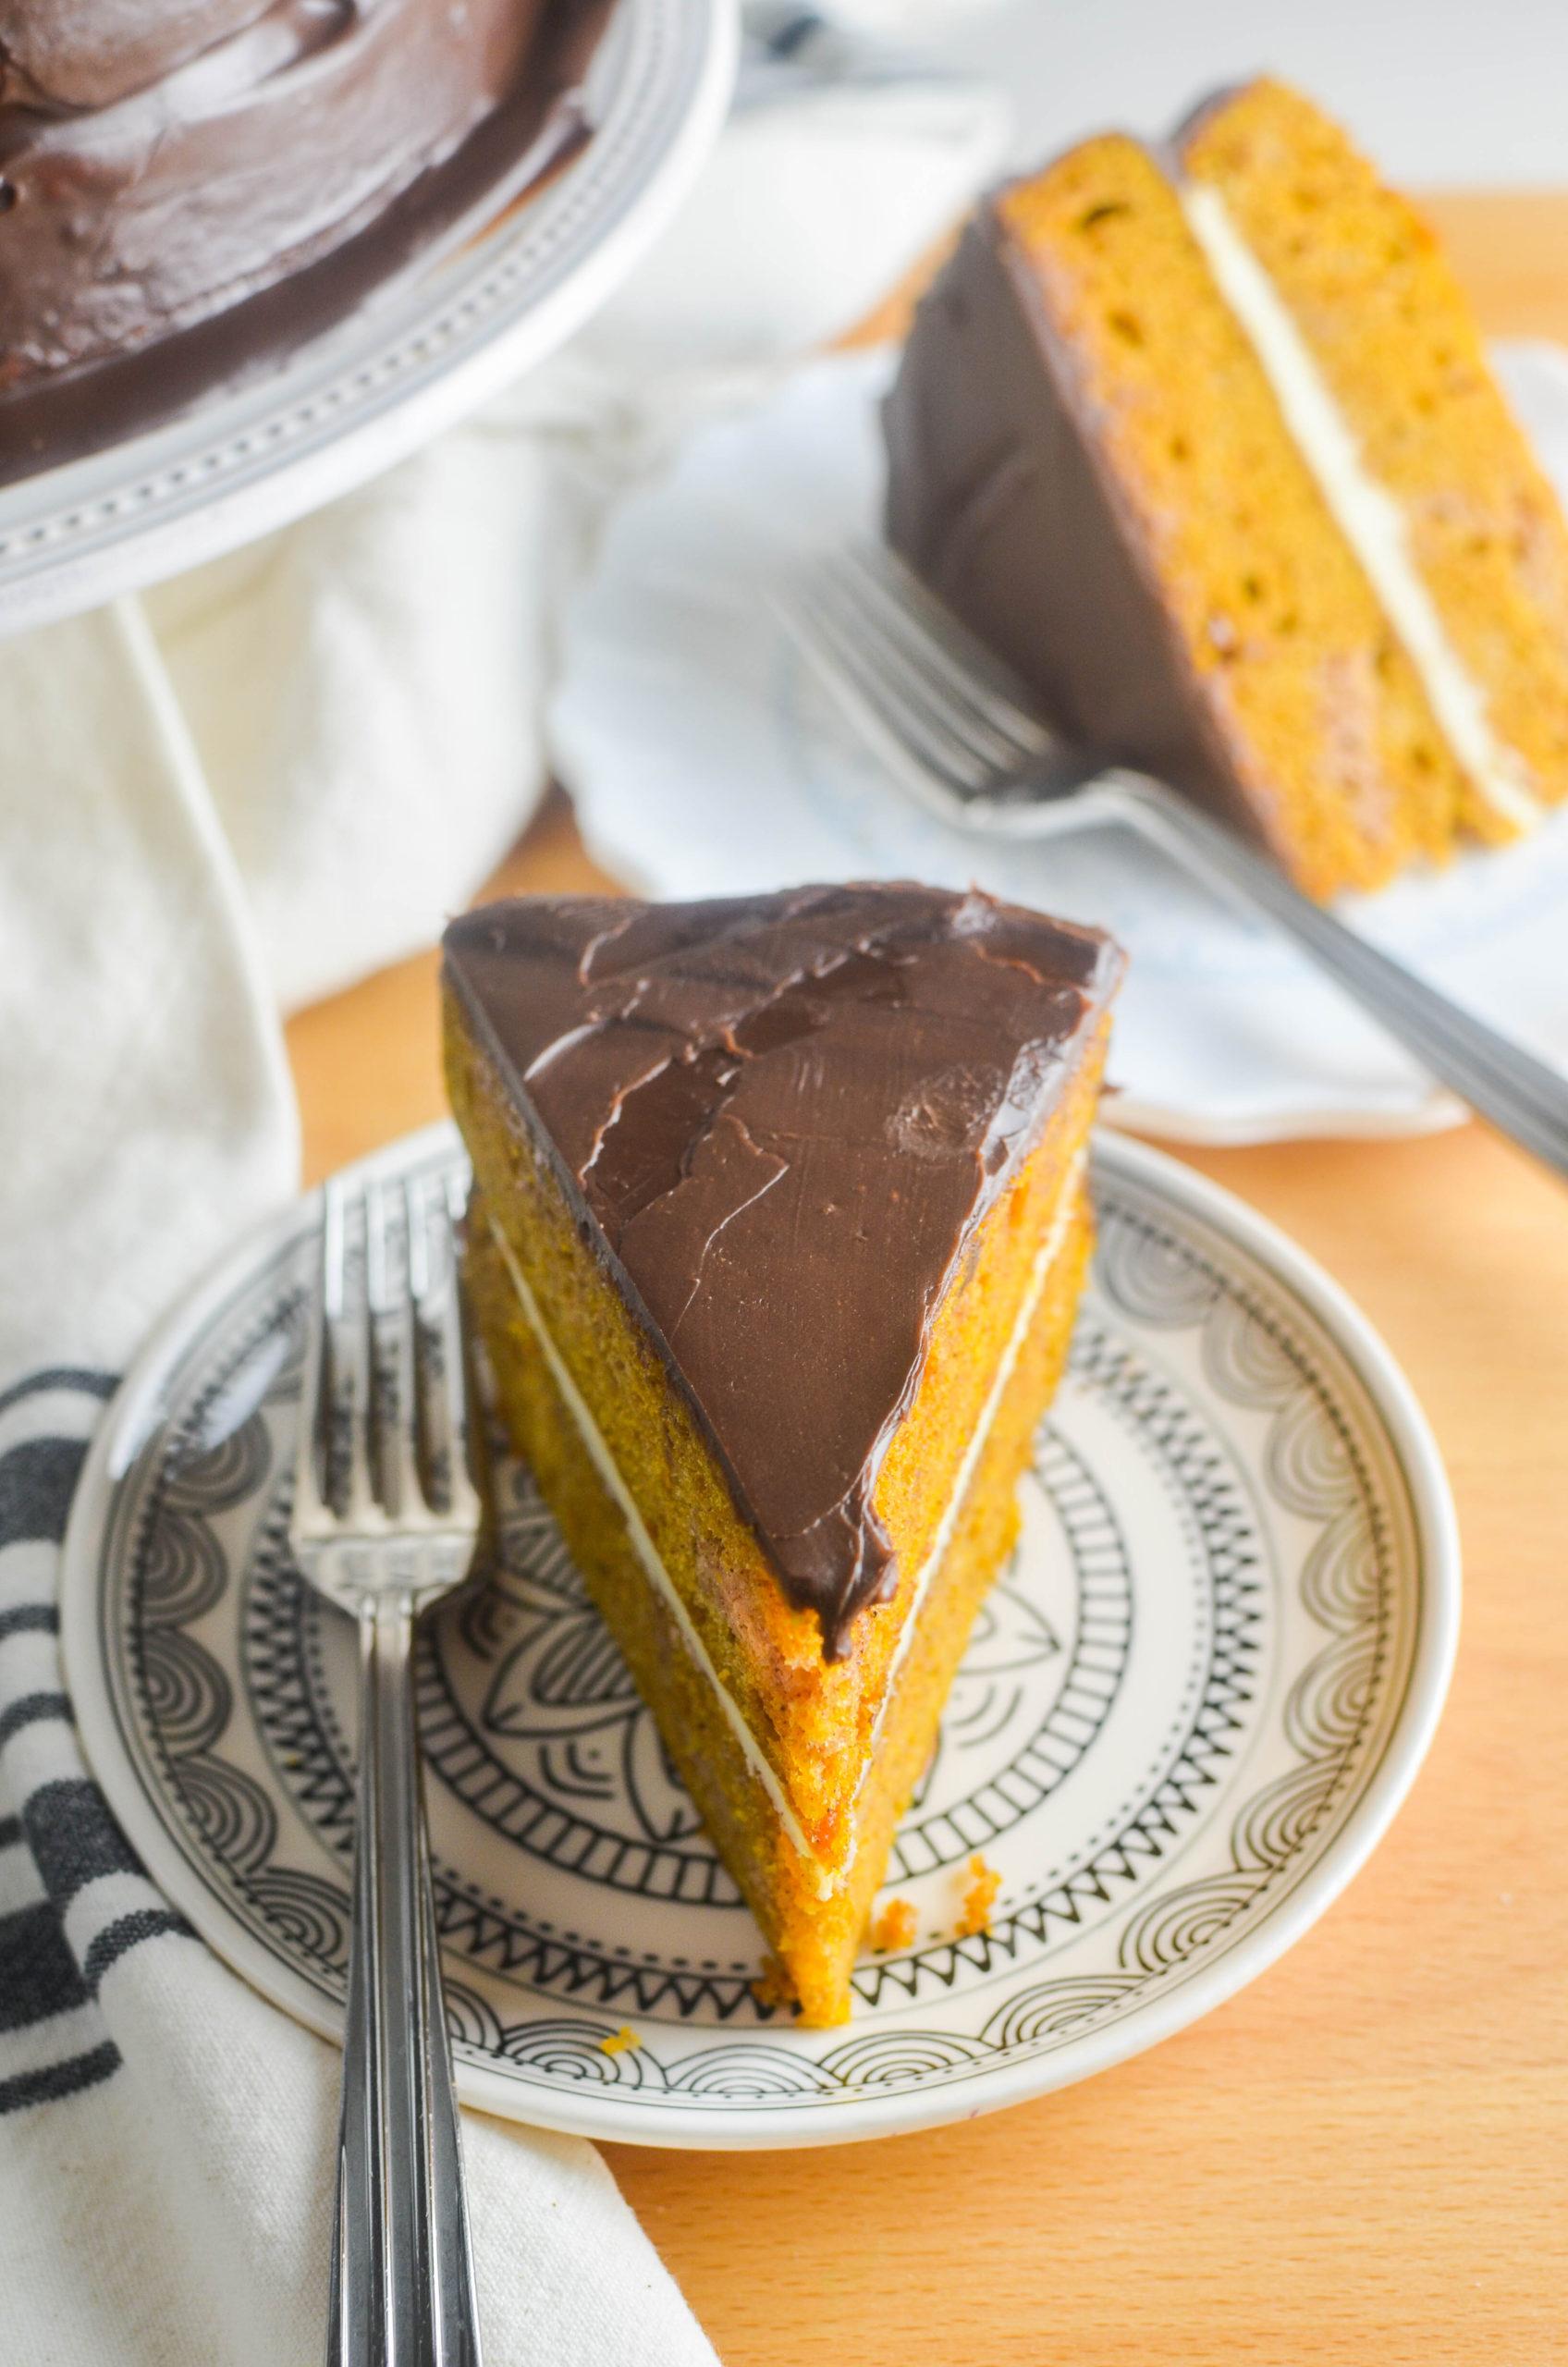 Slice of pumpkin cake with chocolate ganache on a plate.